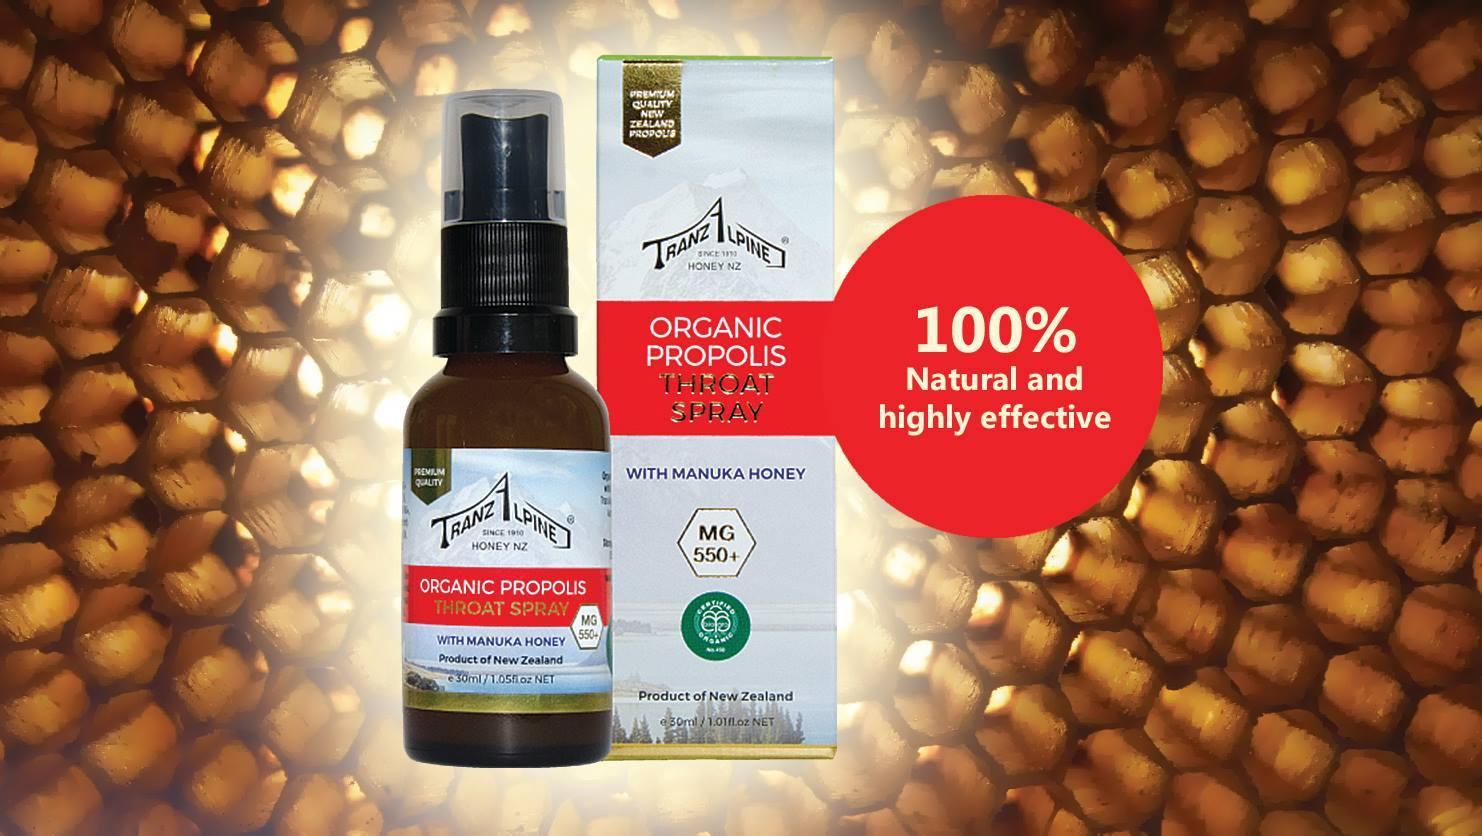 Xịt keo ong Organic Propolis Throat Spray with Manuka Honey MG550+